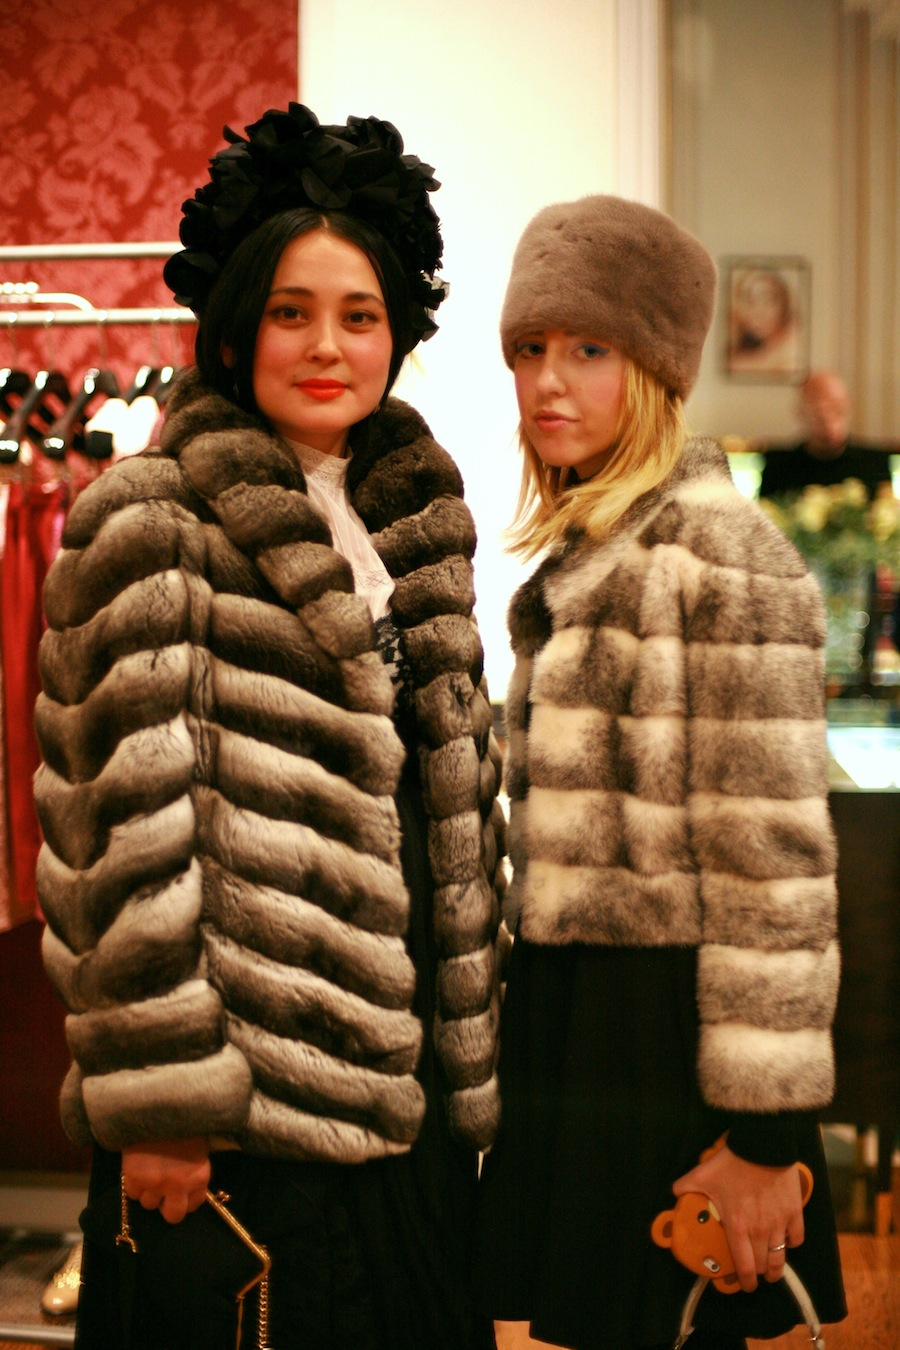 mink_coat_mink_hat_lady_fur_we_love_fur